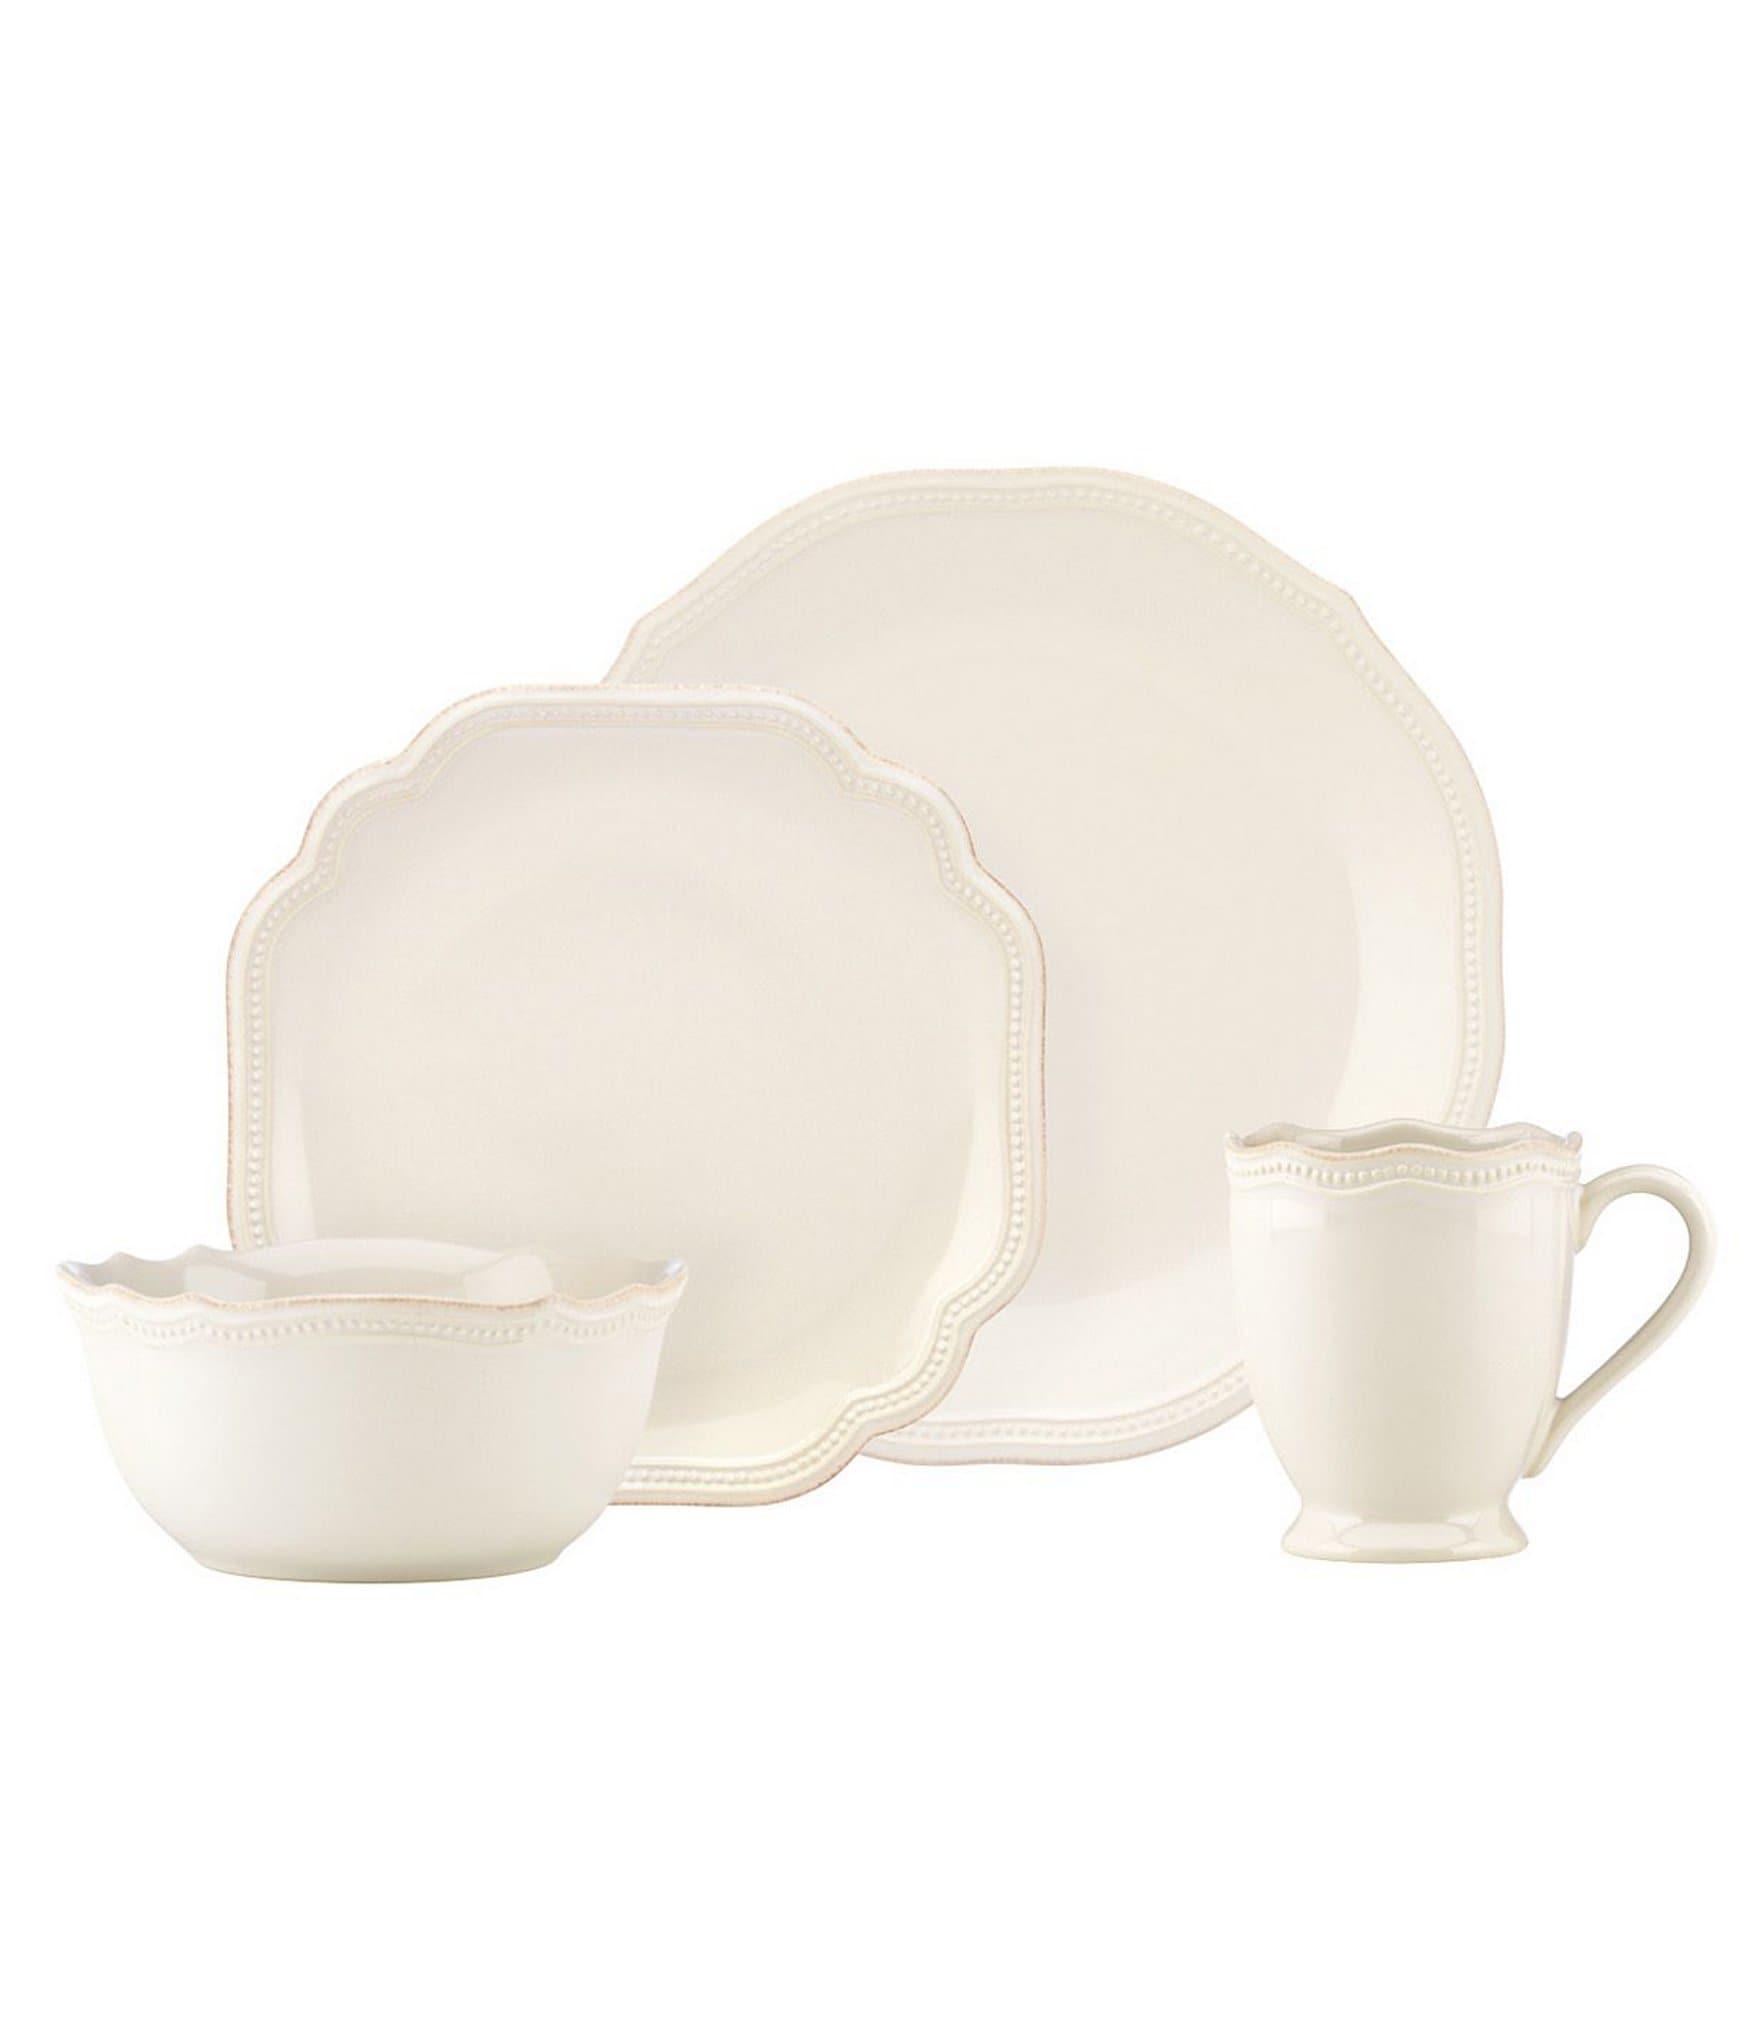 sc 1 st  Dillardu0027s & Casual Everyday Dinnerware: Plates  Dishes u0026 Sets | Dillards